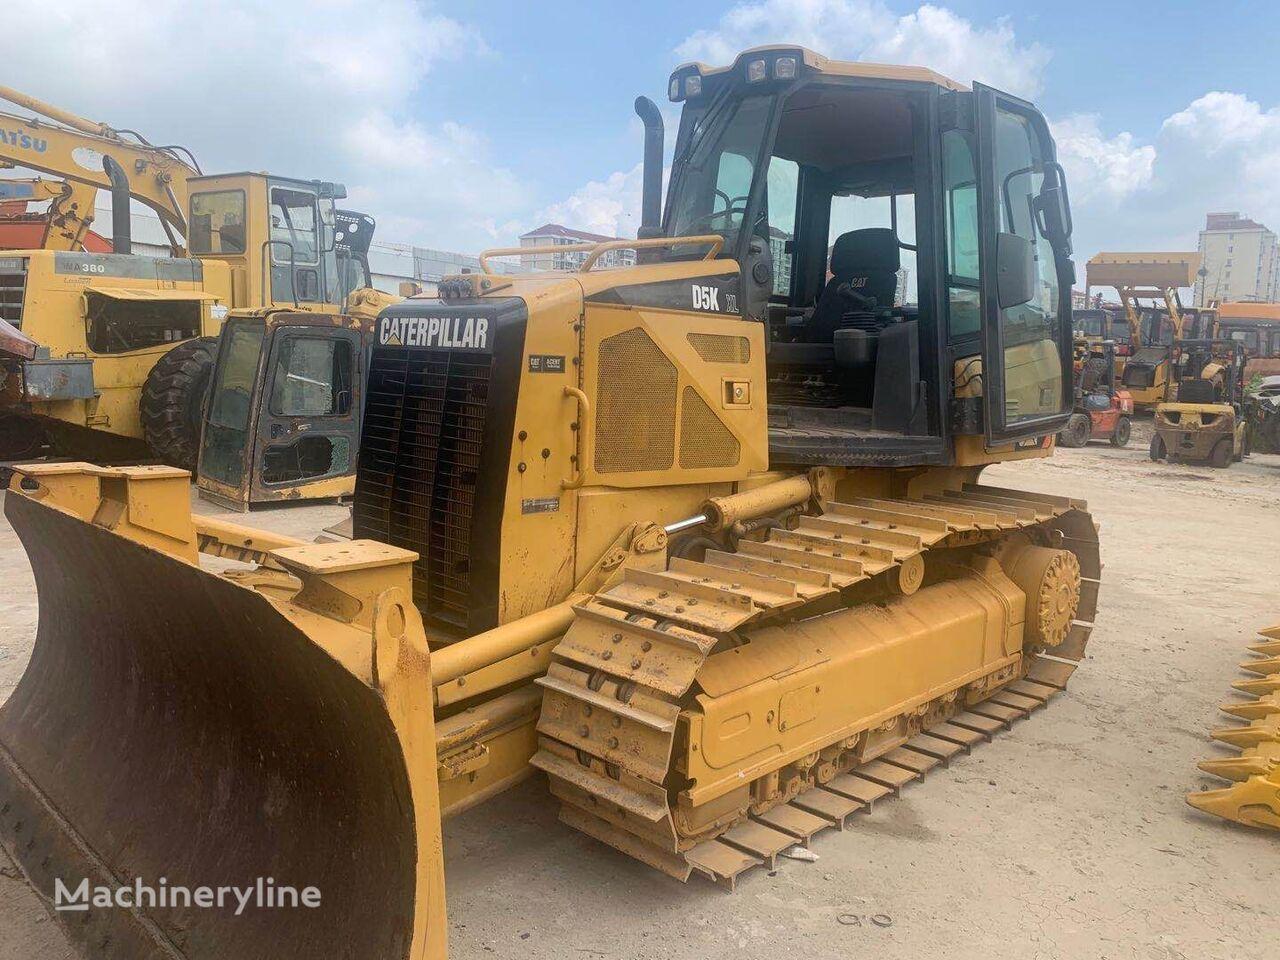 CATERPILLAR USED CAT  D5K  JAPAN  HYDRAULIC  BULLDOZER bulldozer